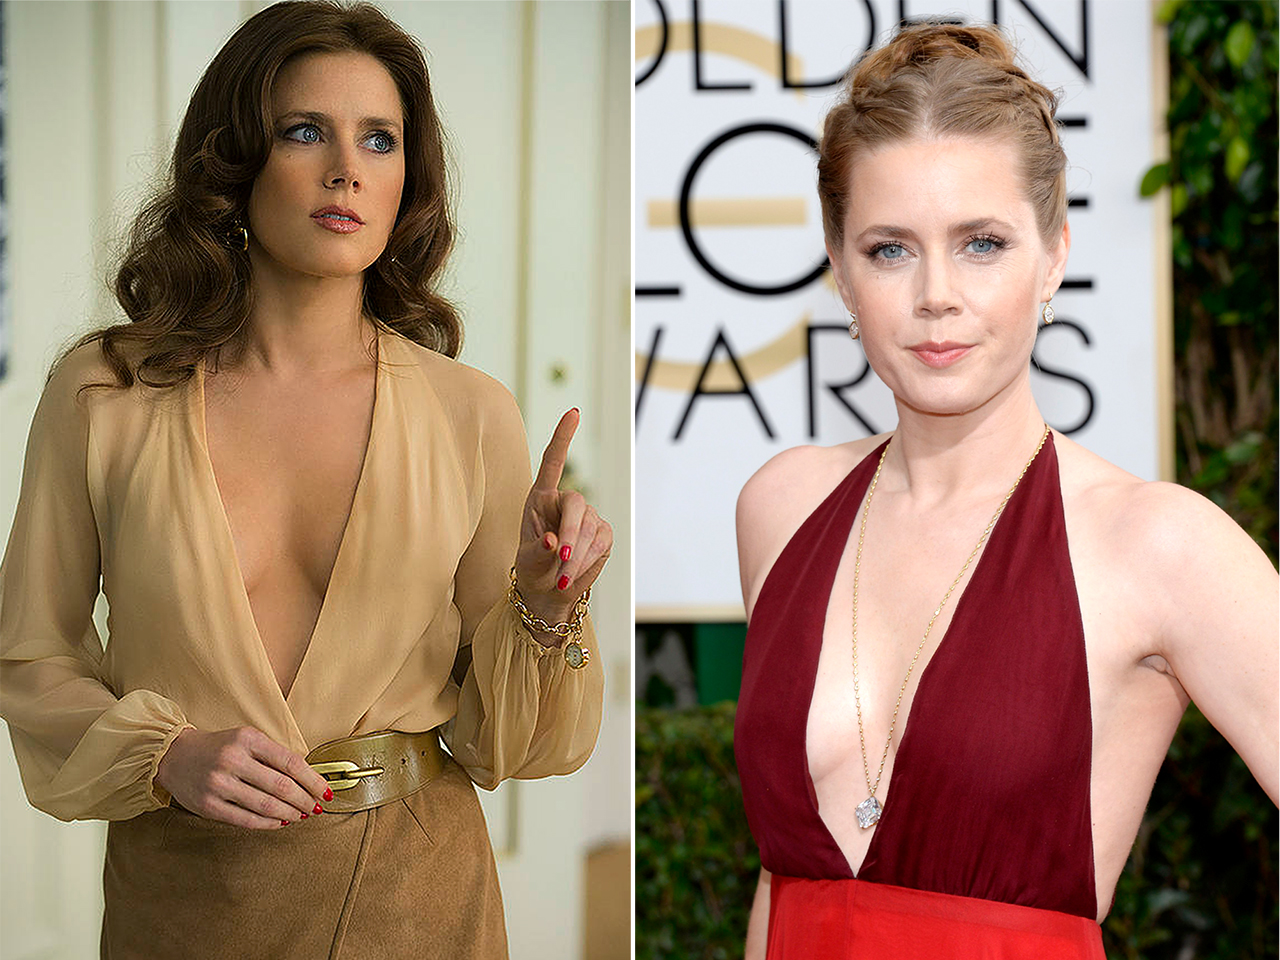 Amy Adams Nipples going deep v: amy adams' plunging neckline returns